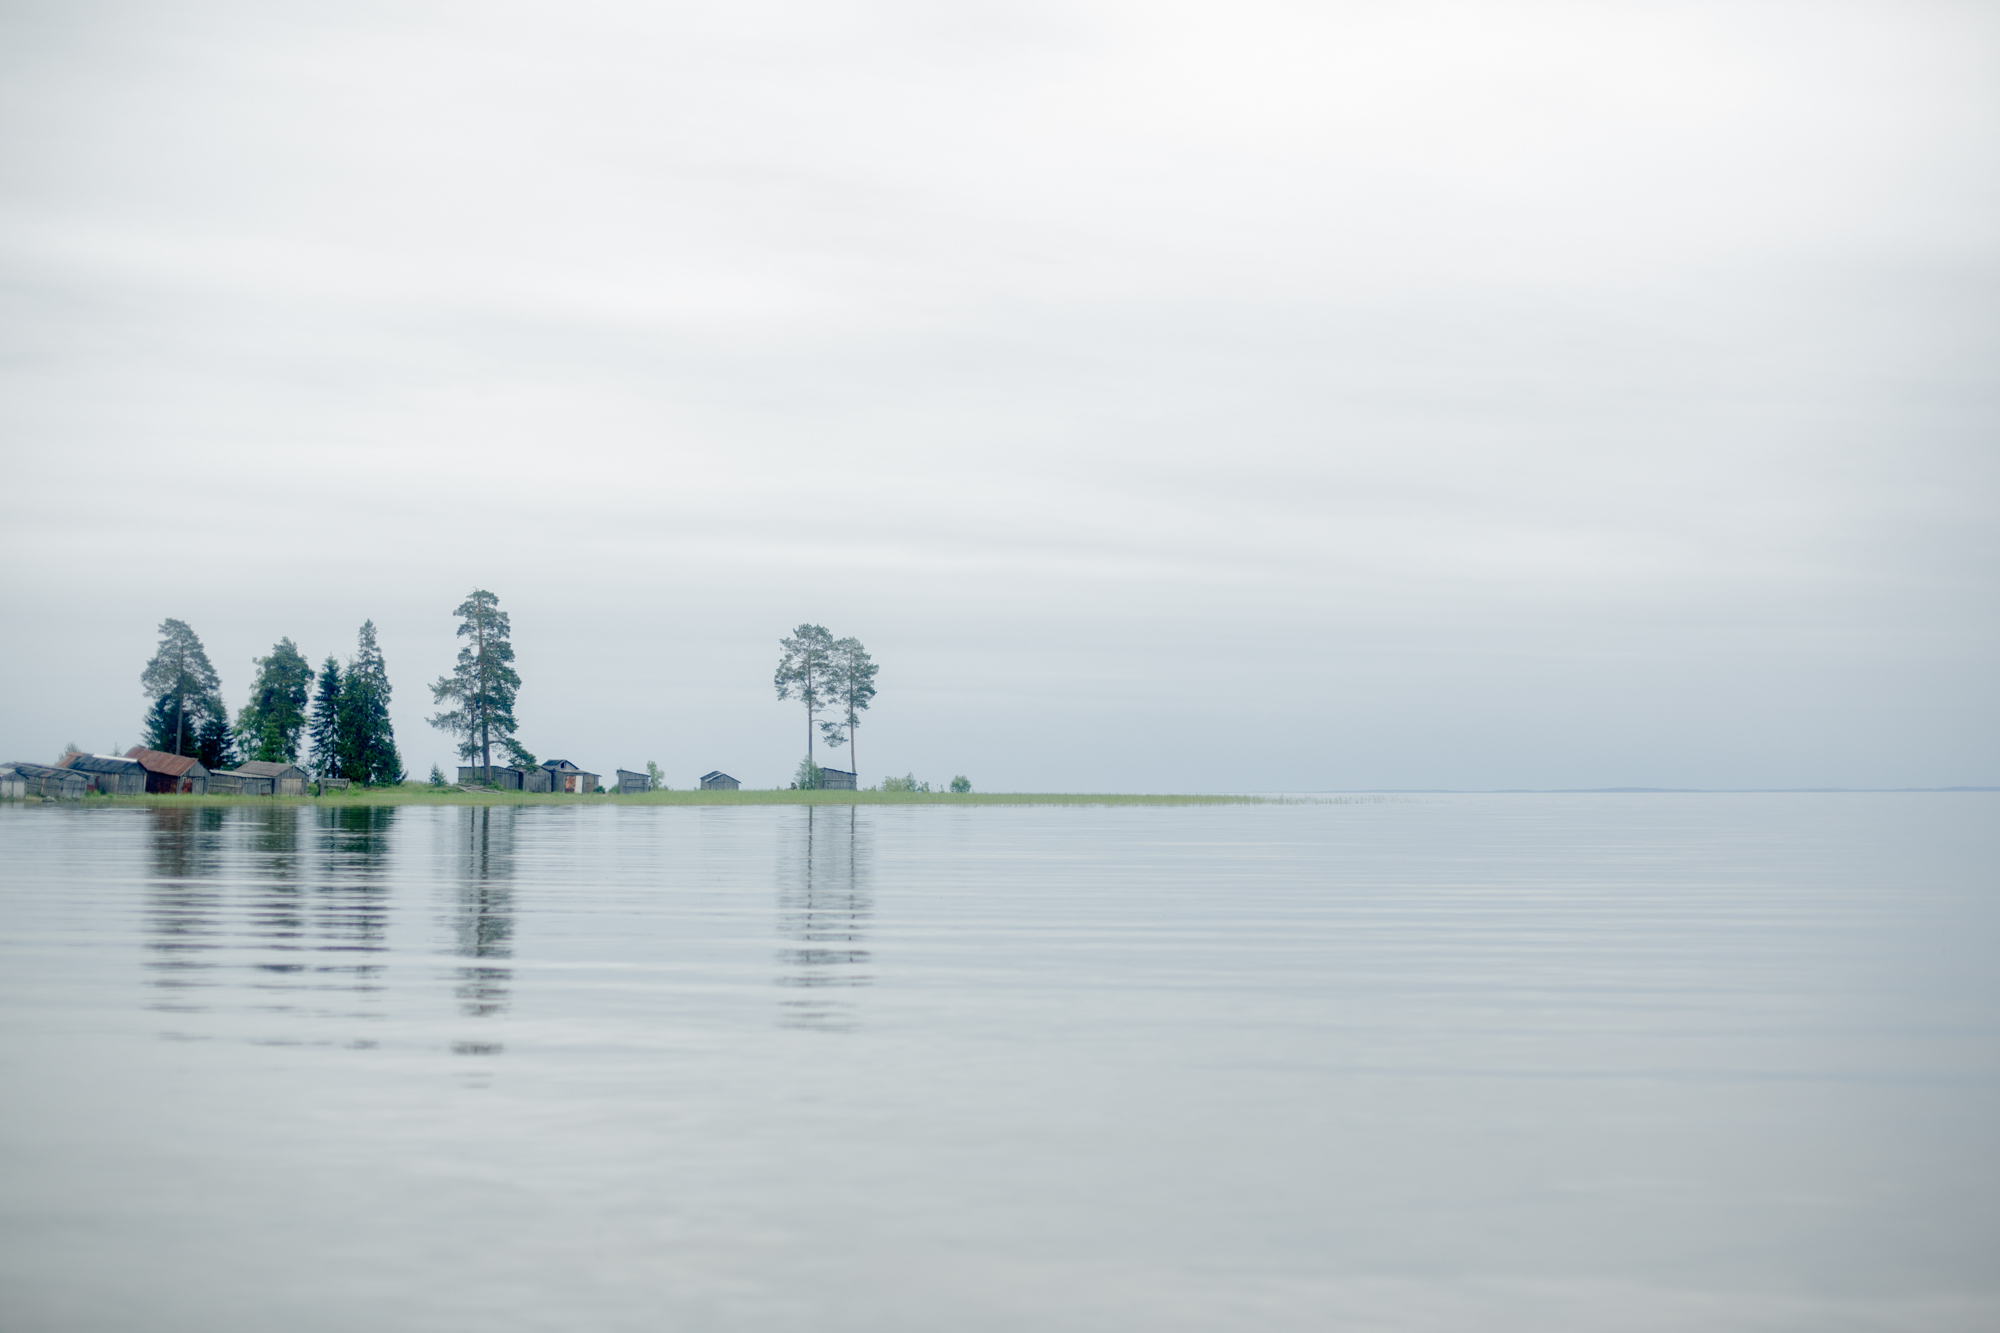 Am Ufer des Onegasees in Sosnowka / Foto © Anna Ivantsova